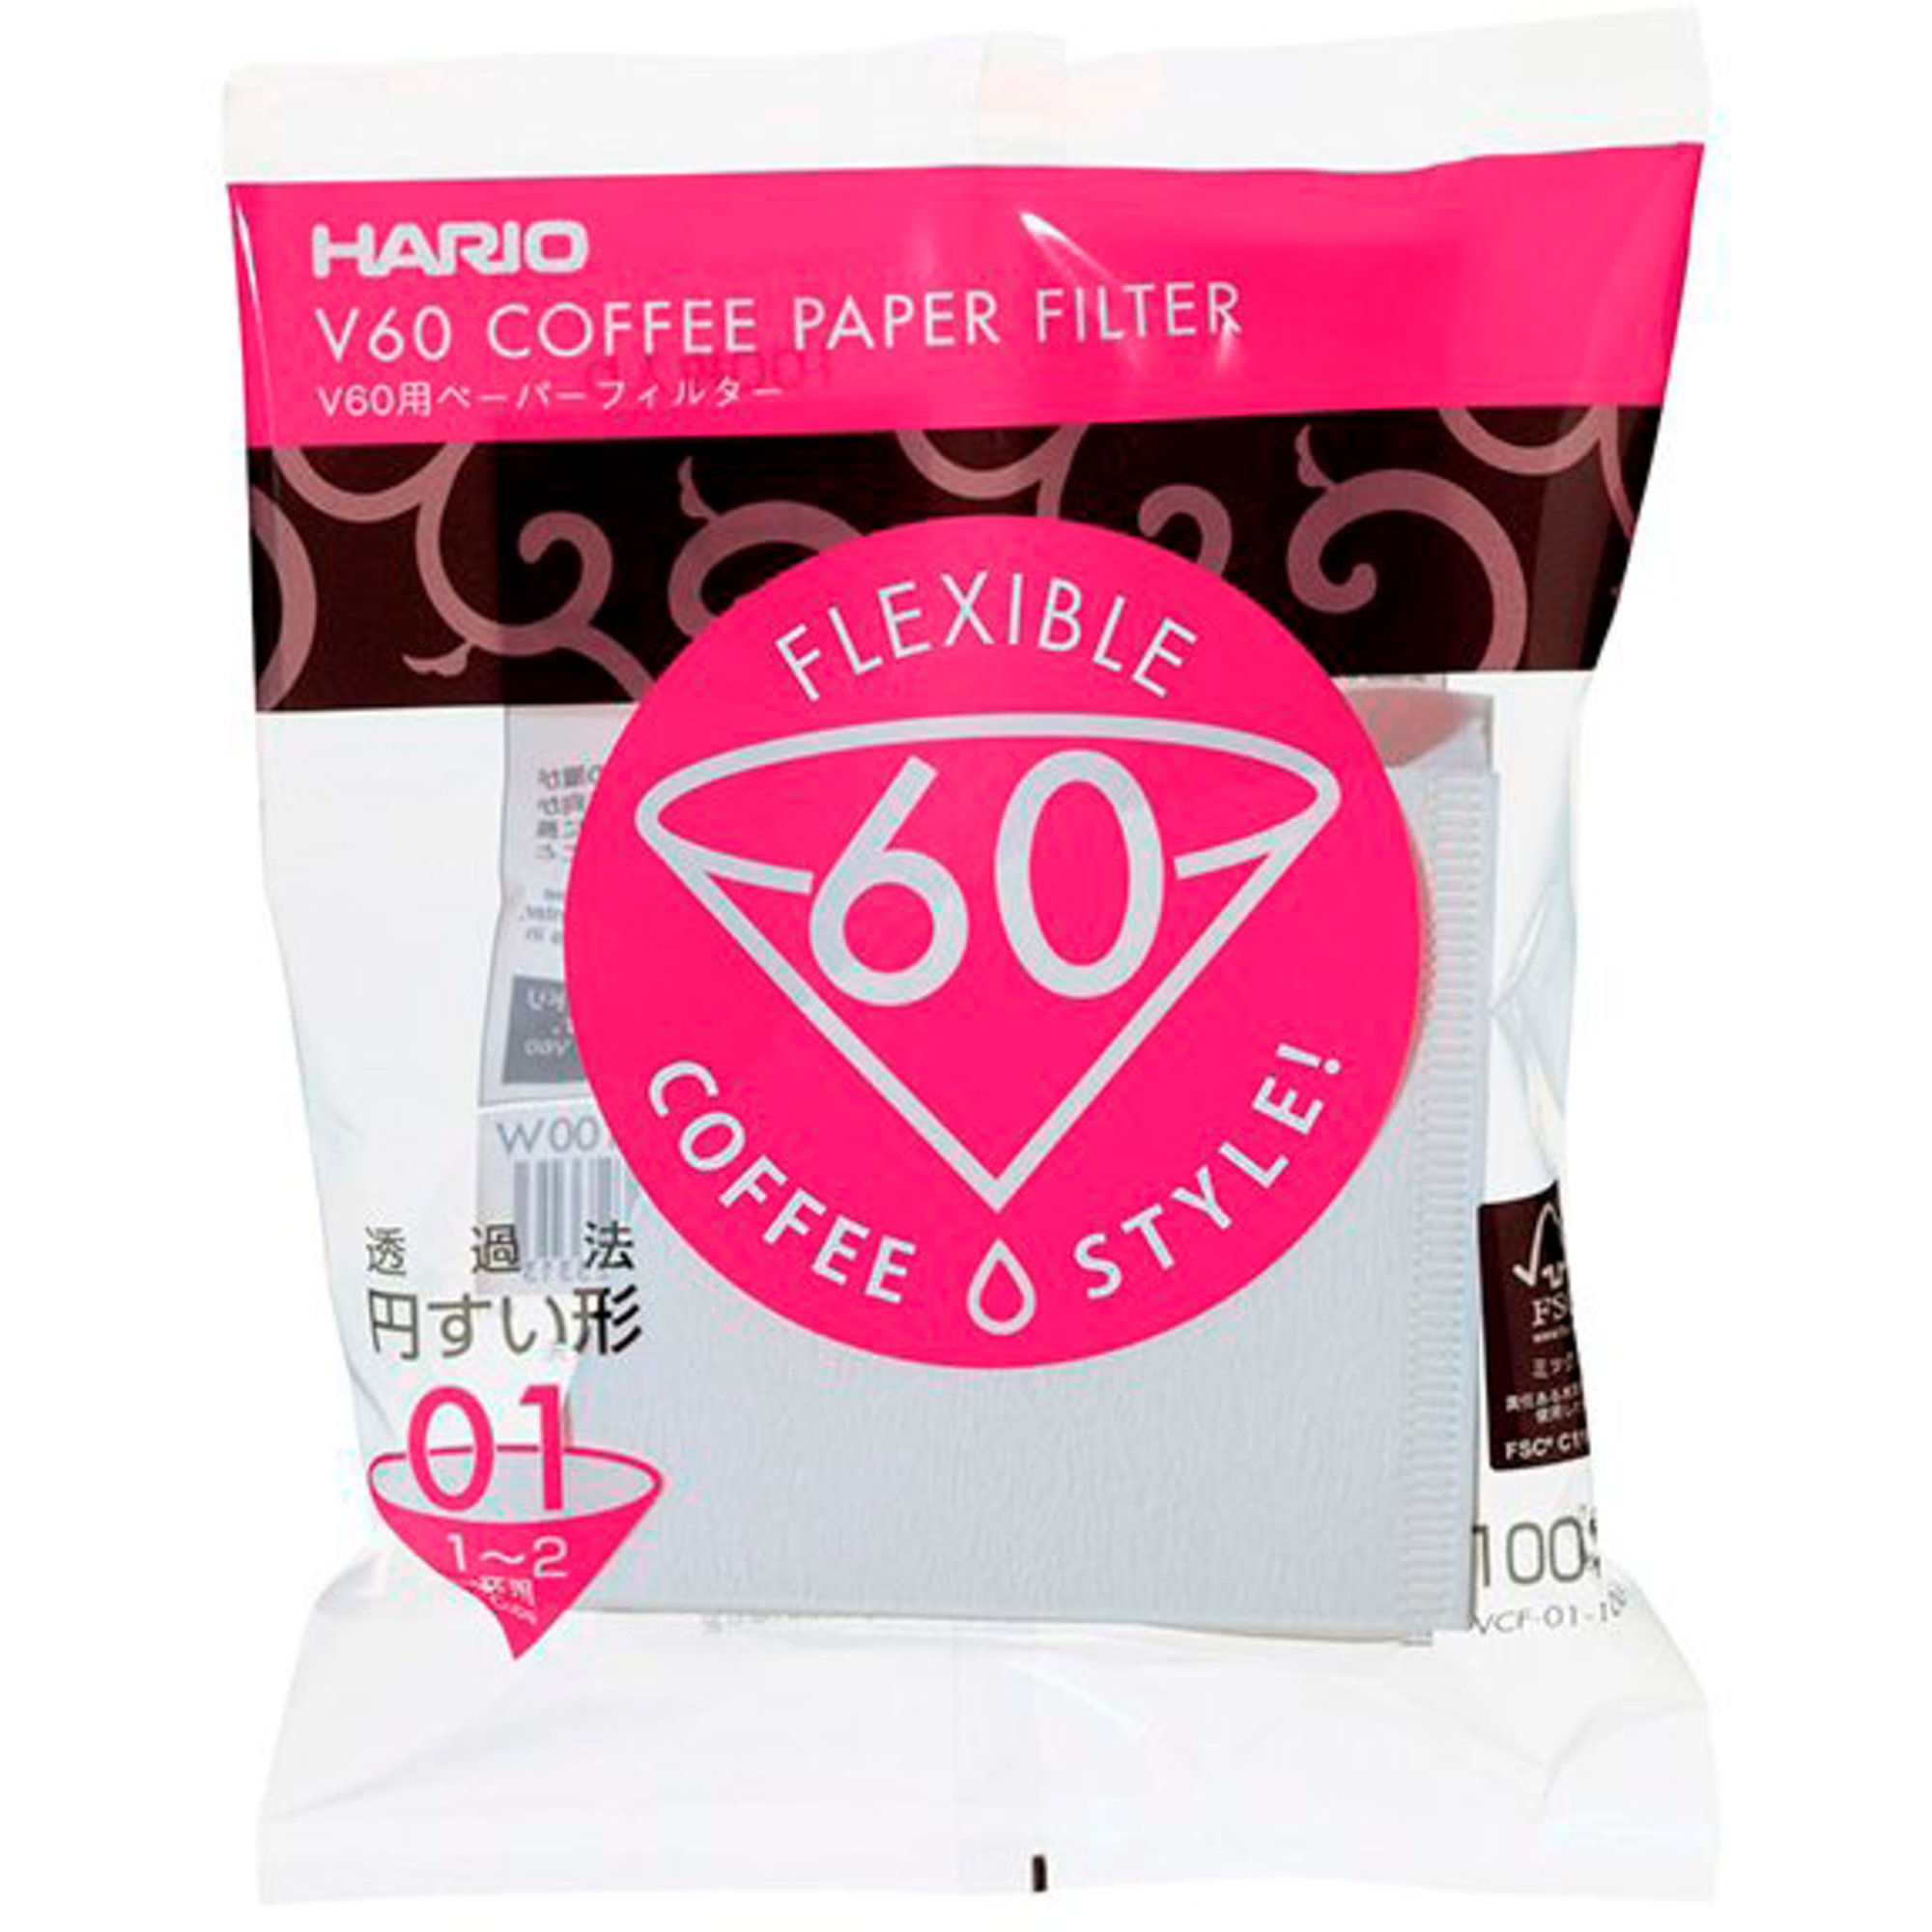 Hario Papir Filter 1 Cup 100 stk.